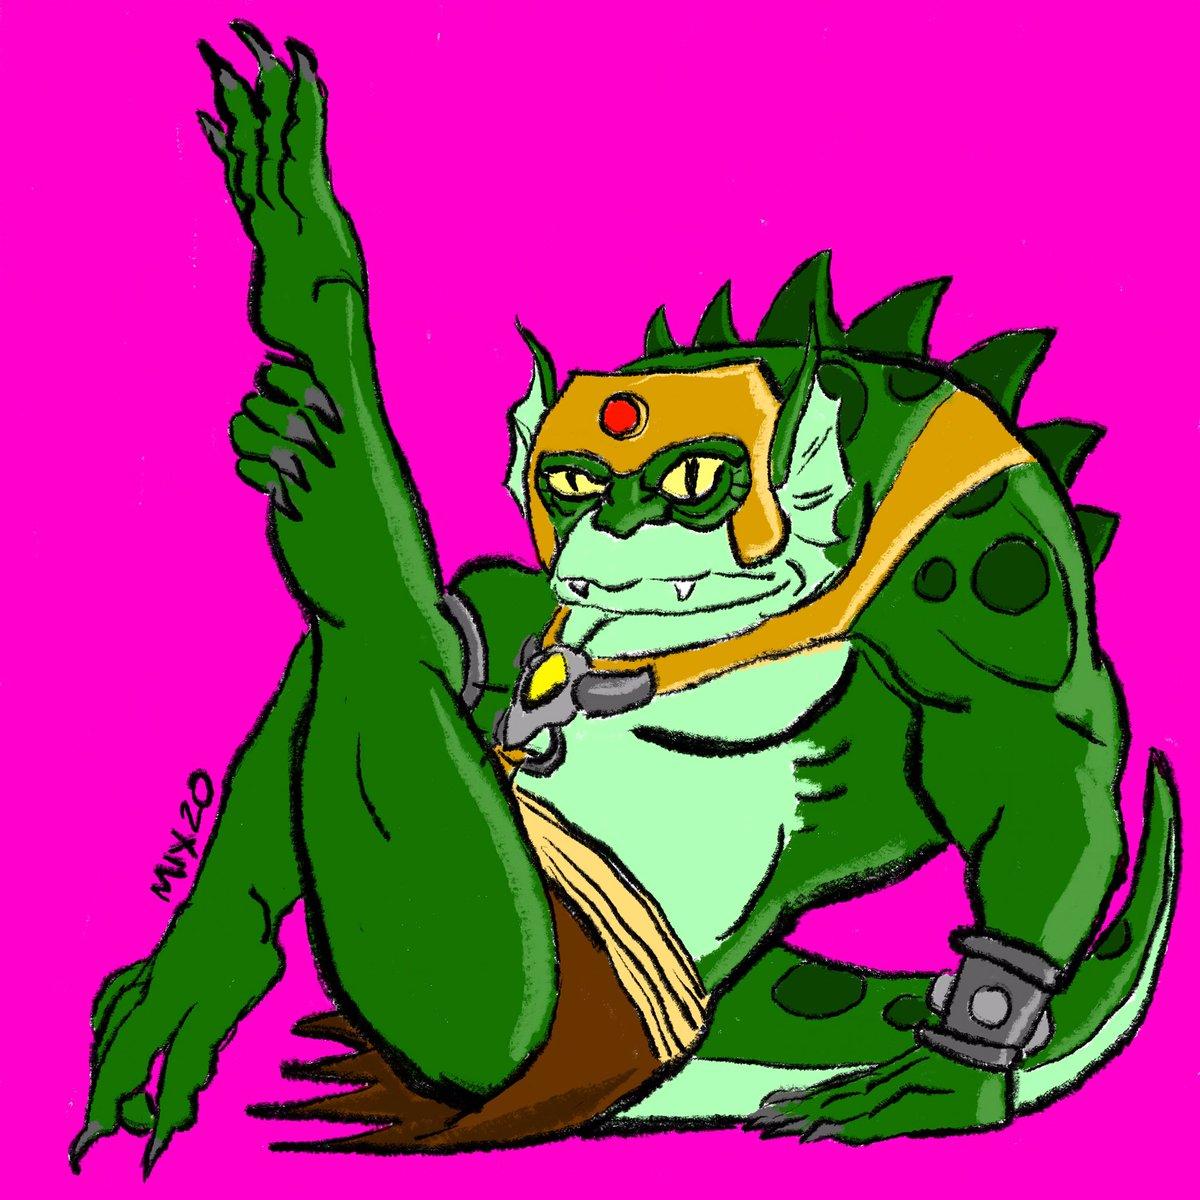 Sssssorry (not ssssorry) WEEK 10 of ThunderCats Thursdays The evil Mutant...💥(sexy) SLITHE! #thundercatthursdays #motudrawingchallenge #slithe #thundercats #mutants #cartoons #drawingchallenge  #mastersoftheuniverse @MOTUdrawing #80scartoons #patreon @patreon @adobefresco